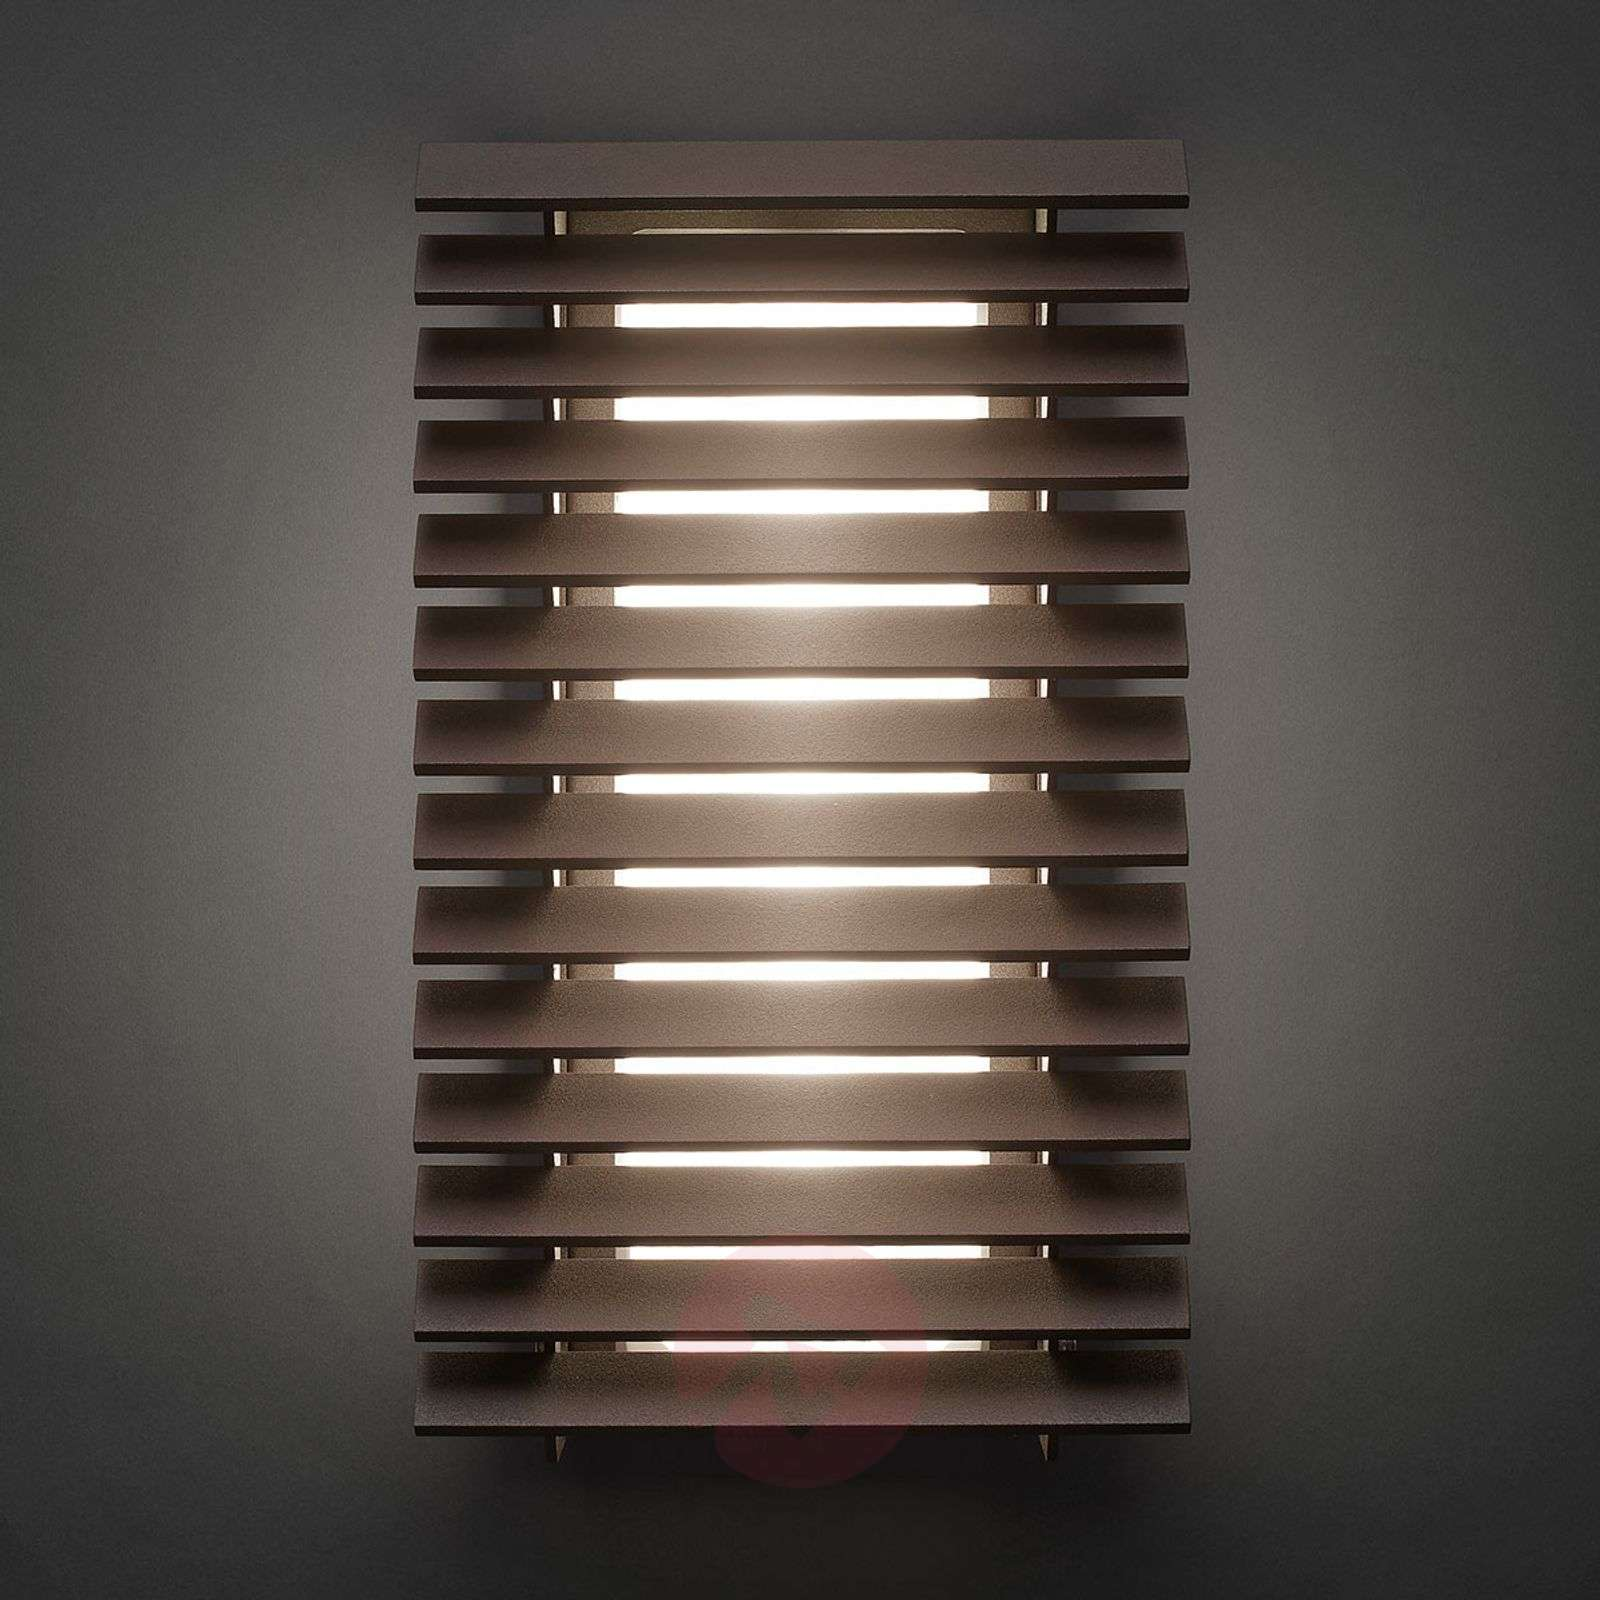 Bover Lineana V-LED-ulkoseinävalaisin, ruskea-1569023-01